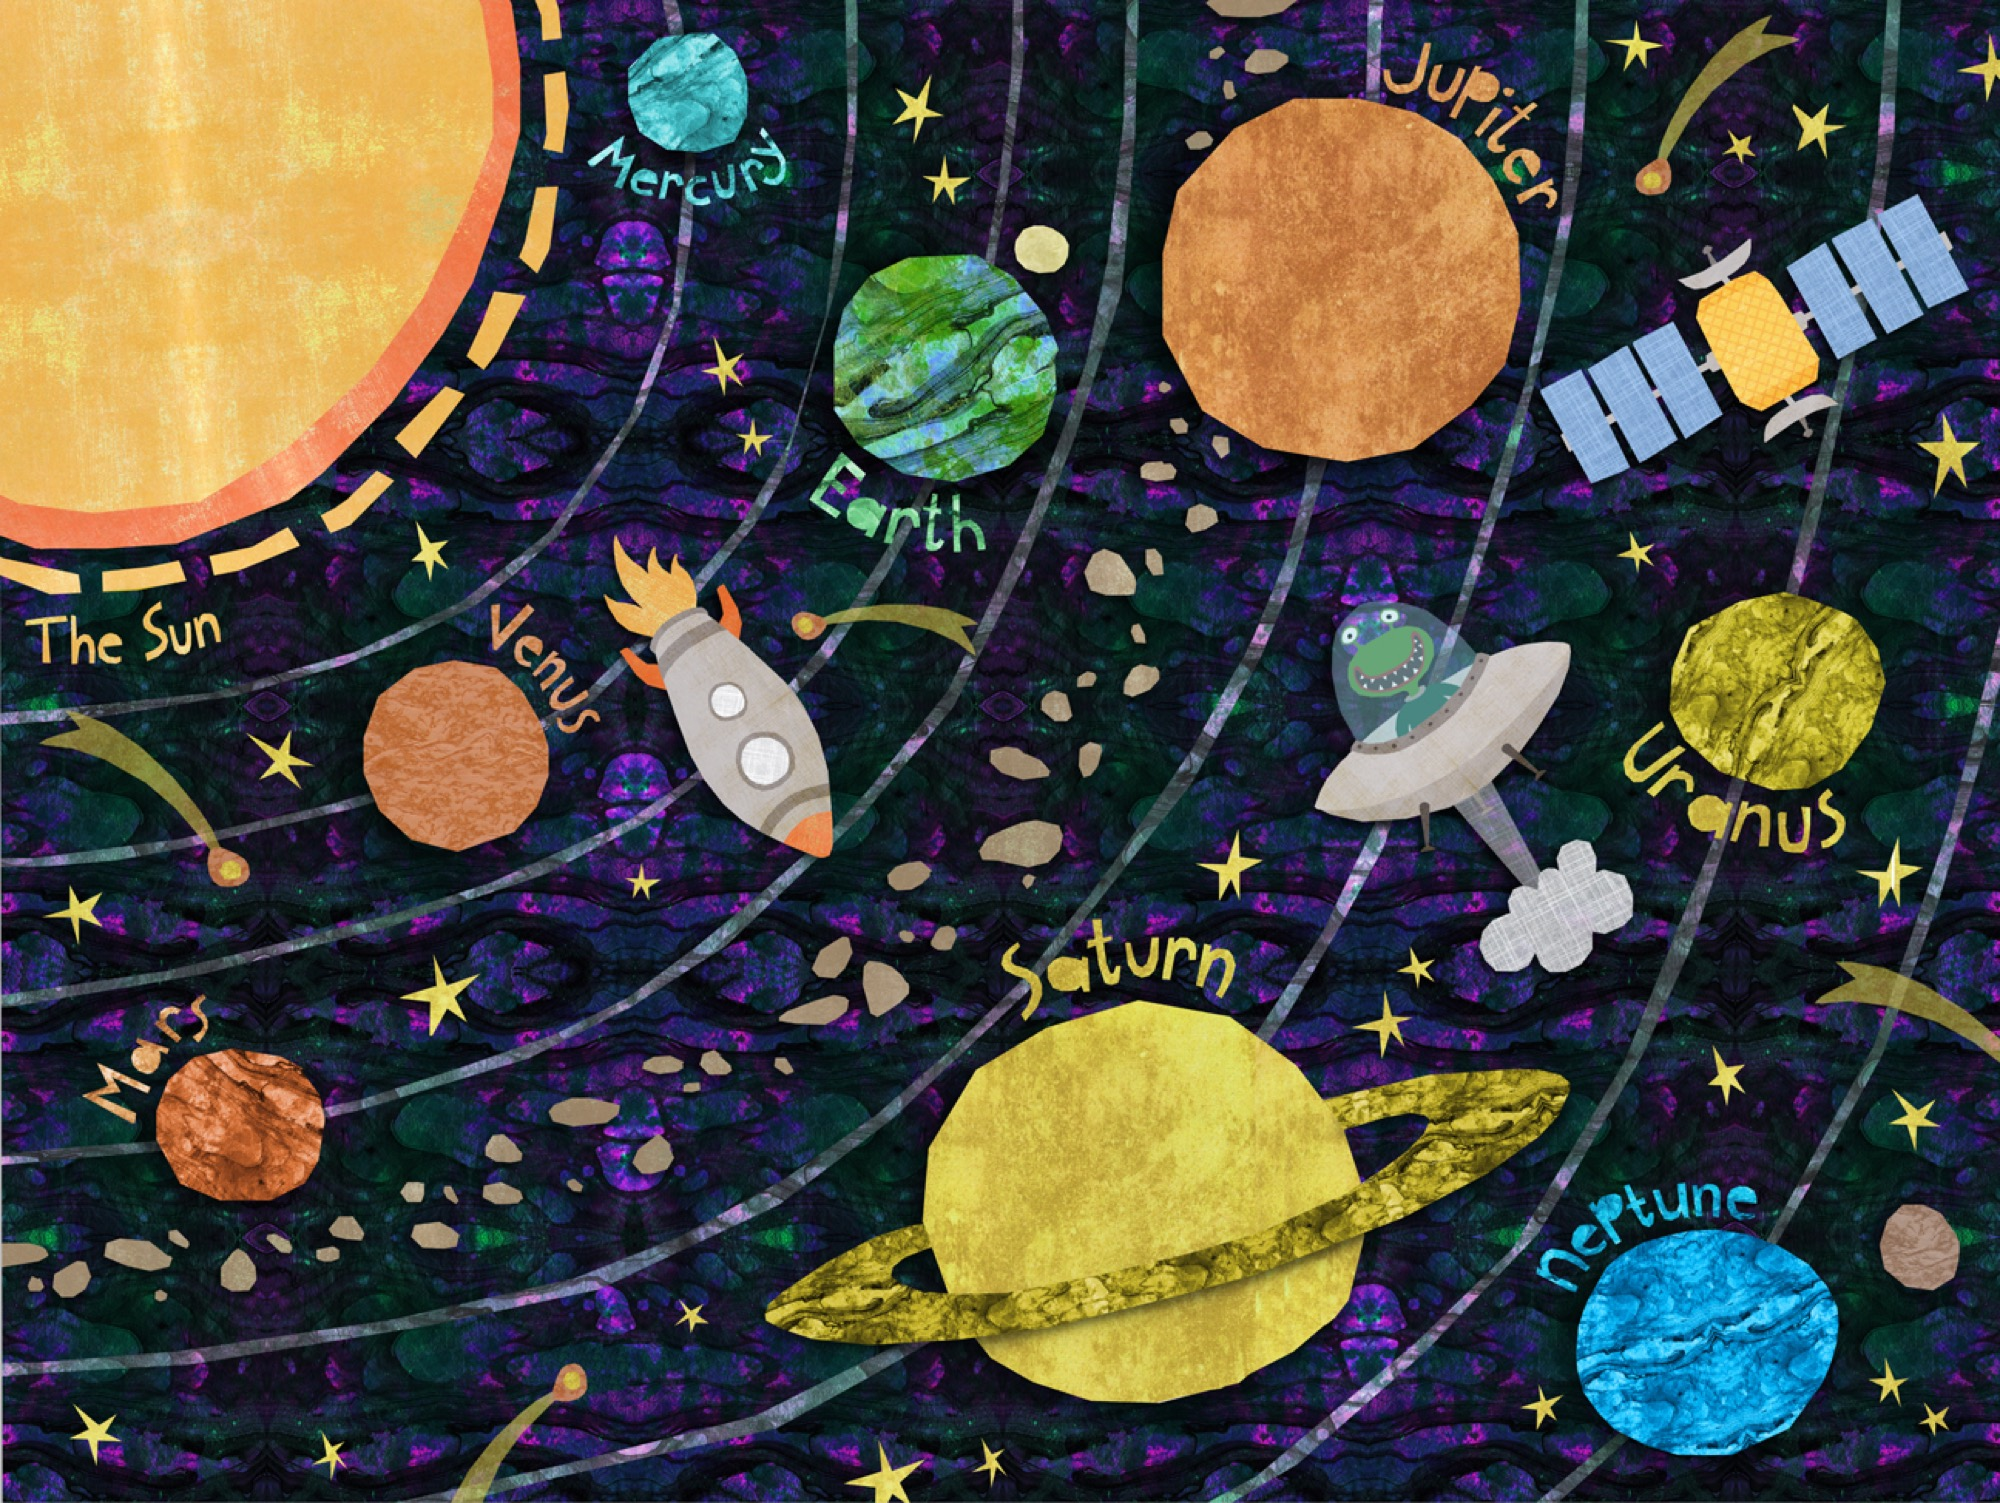 universe solar system paintings art - HD1296×974